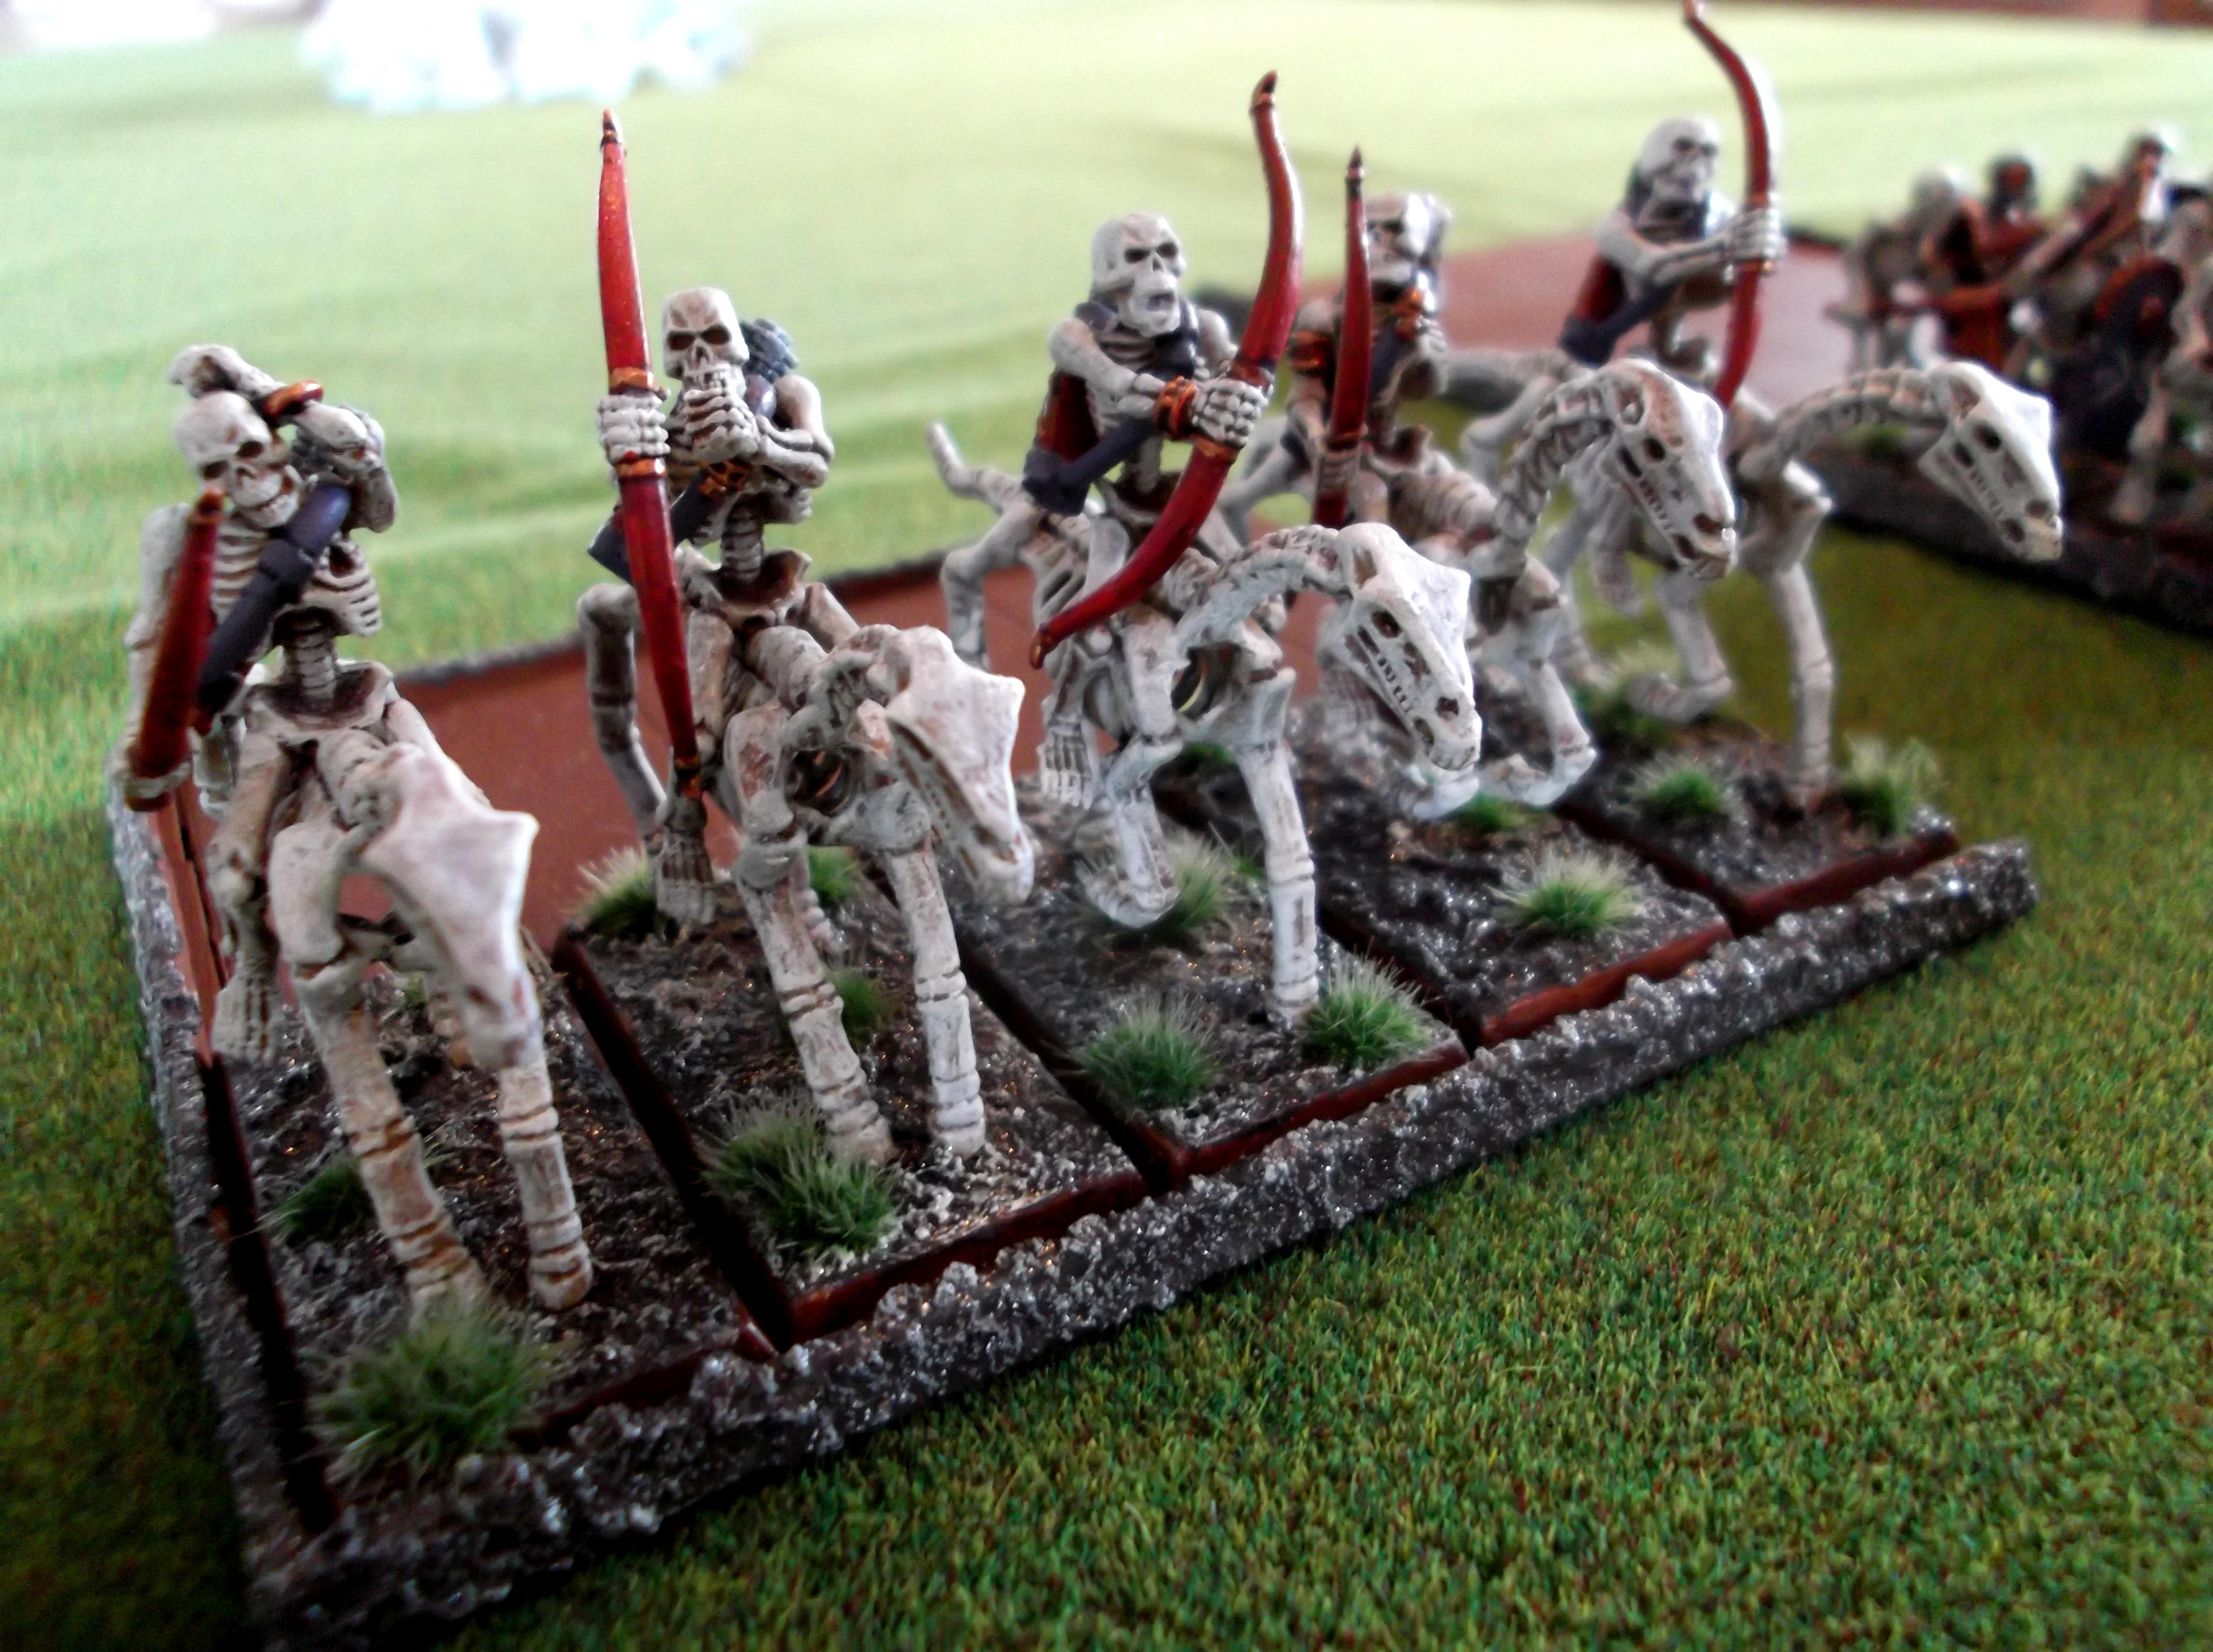 Skeletons, Skull, Tomb Kings, Undead, Warhammer Fantasy